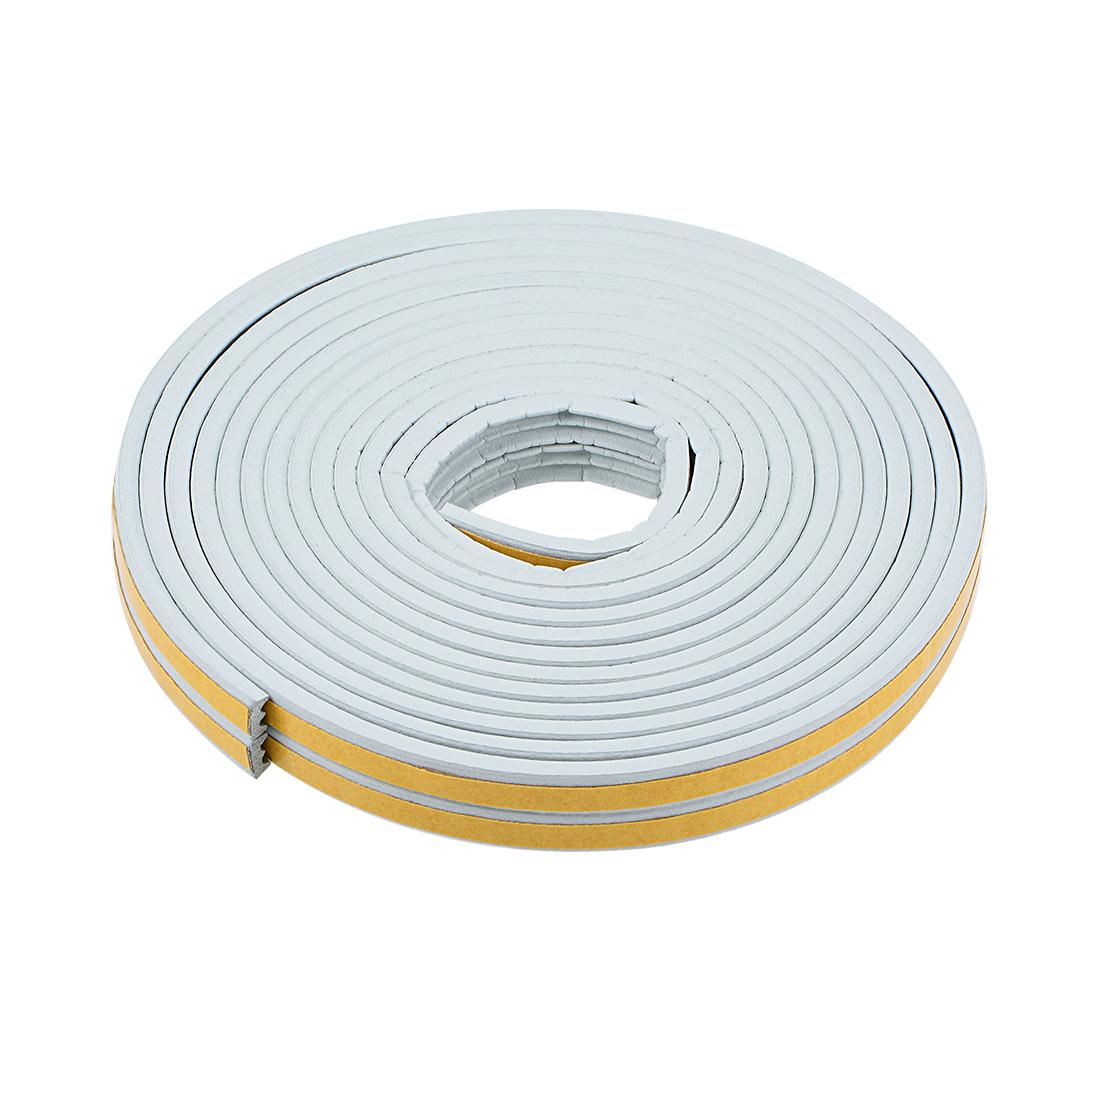 Foam Tape Adhesive 9mm Width 4mm Thick, Total 26 Feet Long Gray 2Pcs